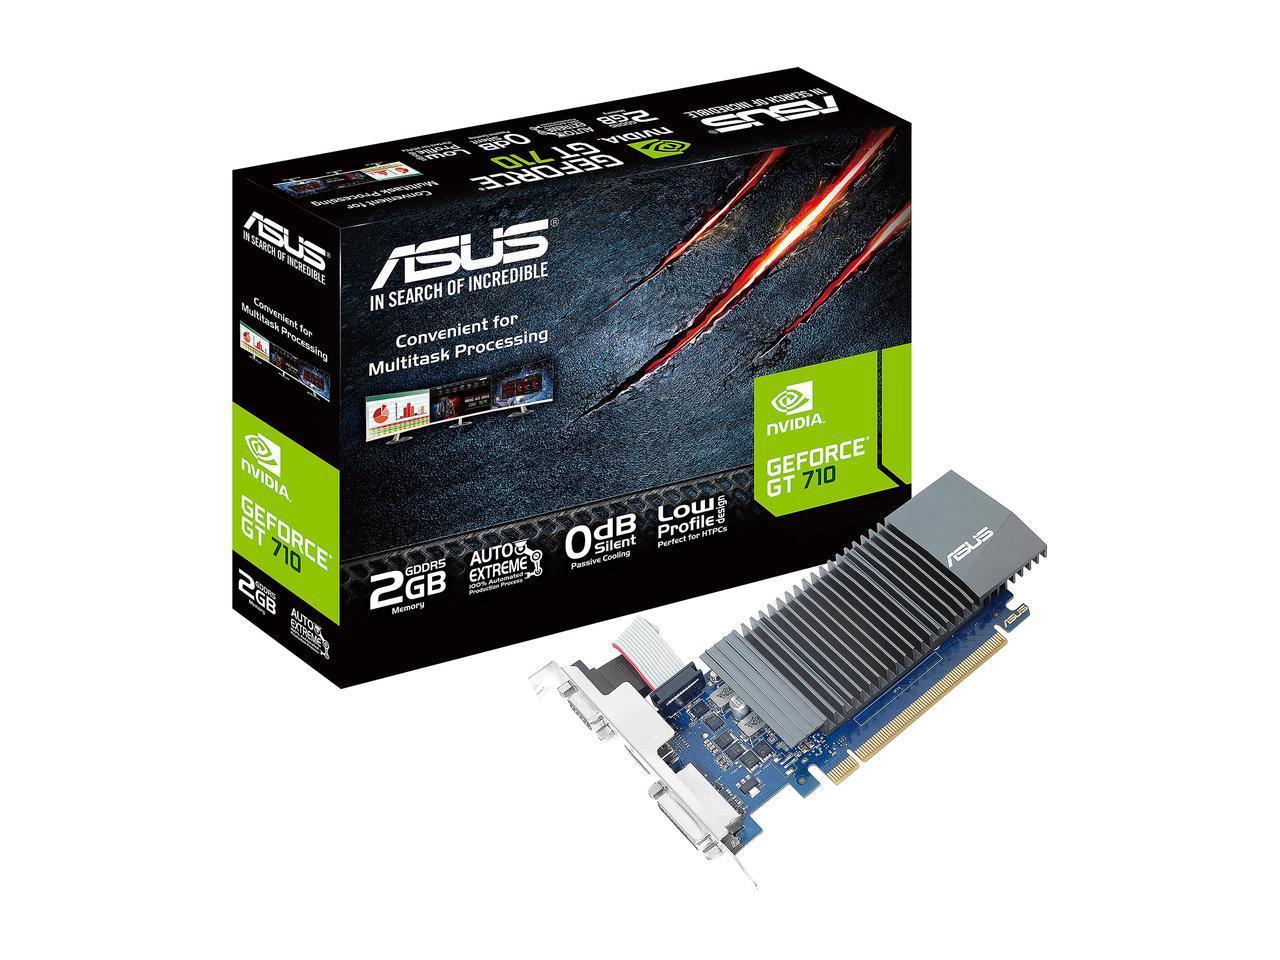 Видео карта ASUS GeForce GT 710, 2GB, GDDR5, 64 bit, D-Sub, DVI-D, HDMI GT710-SL-2GD5-BRK